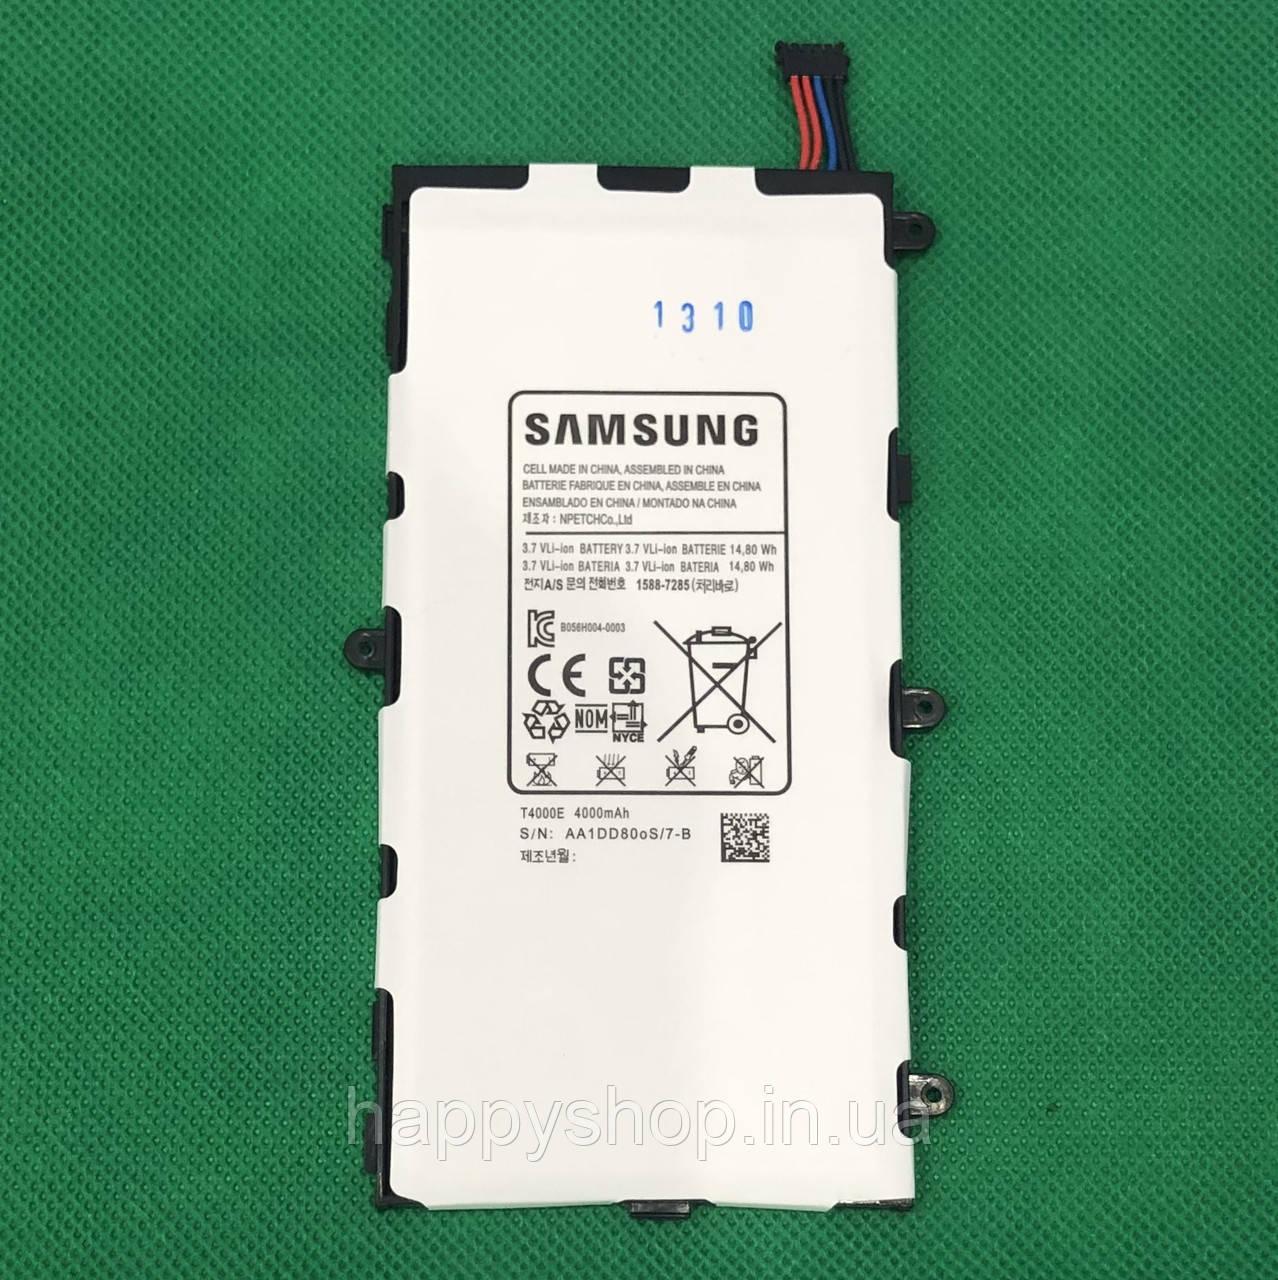 Оригинальная батарея для Samsung P3200/P3210 (T4000E)